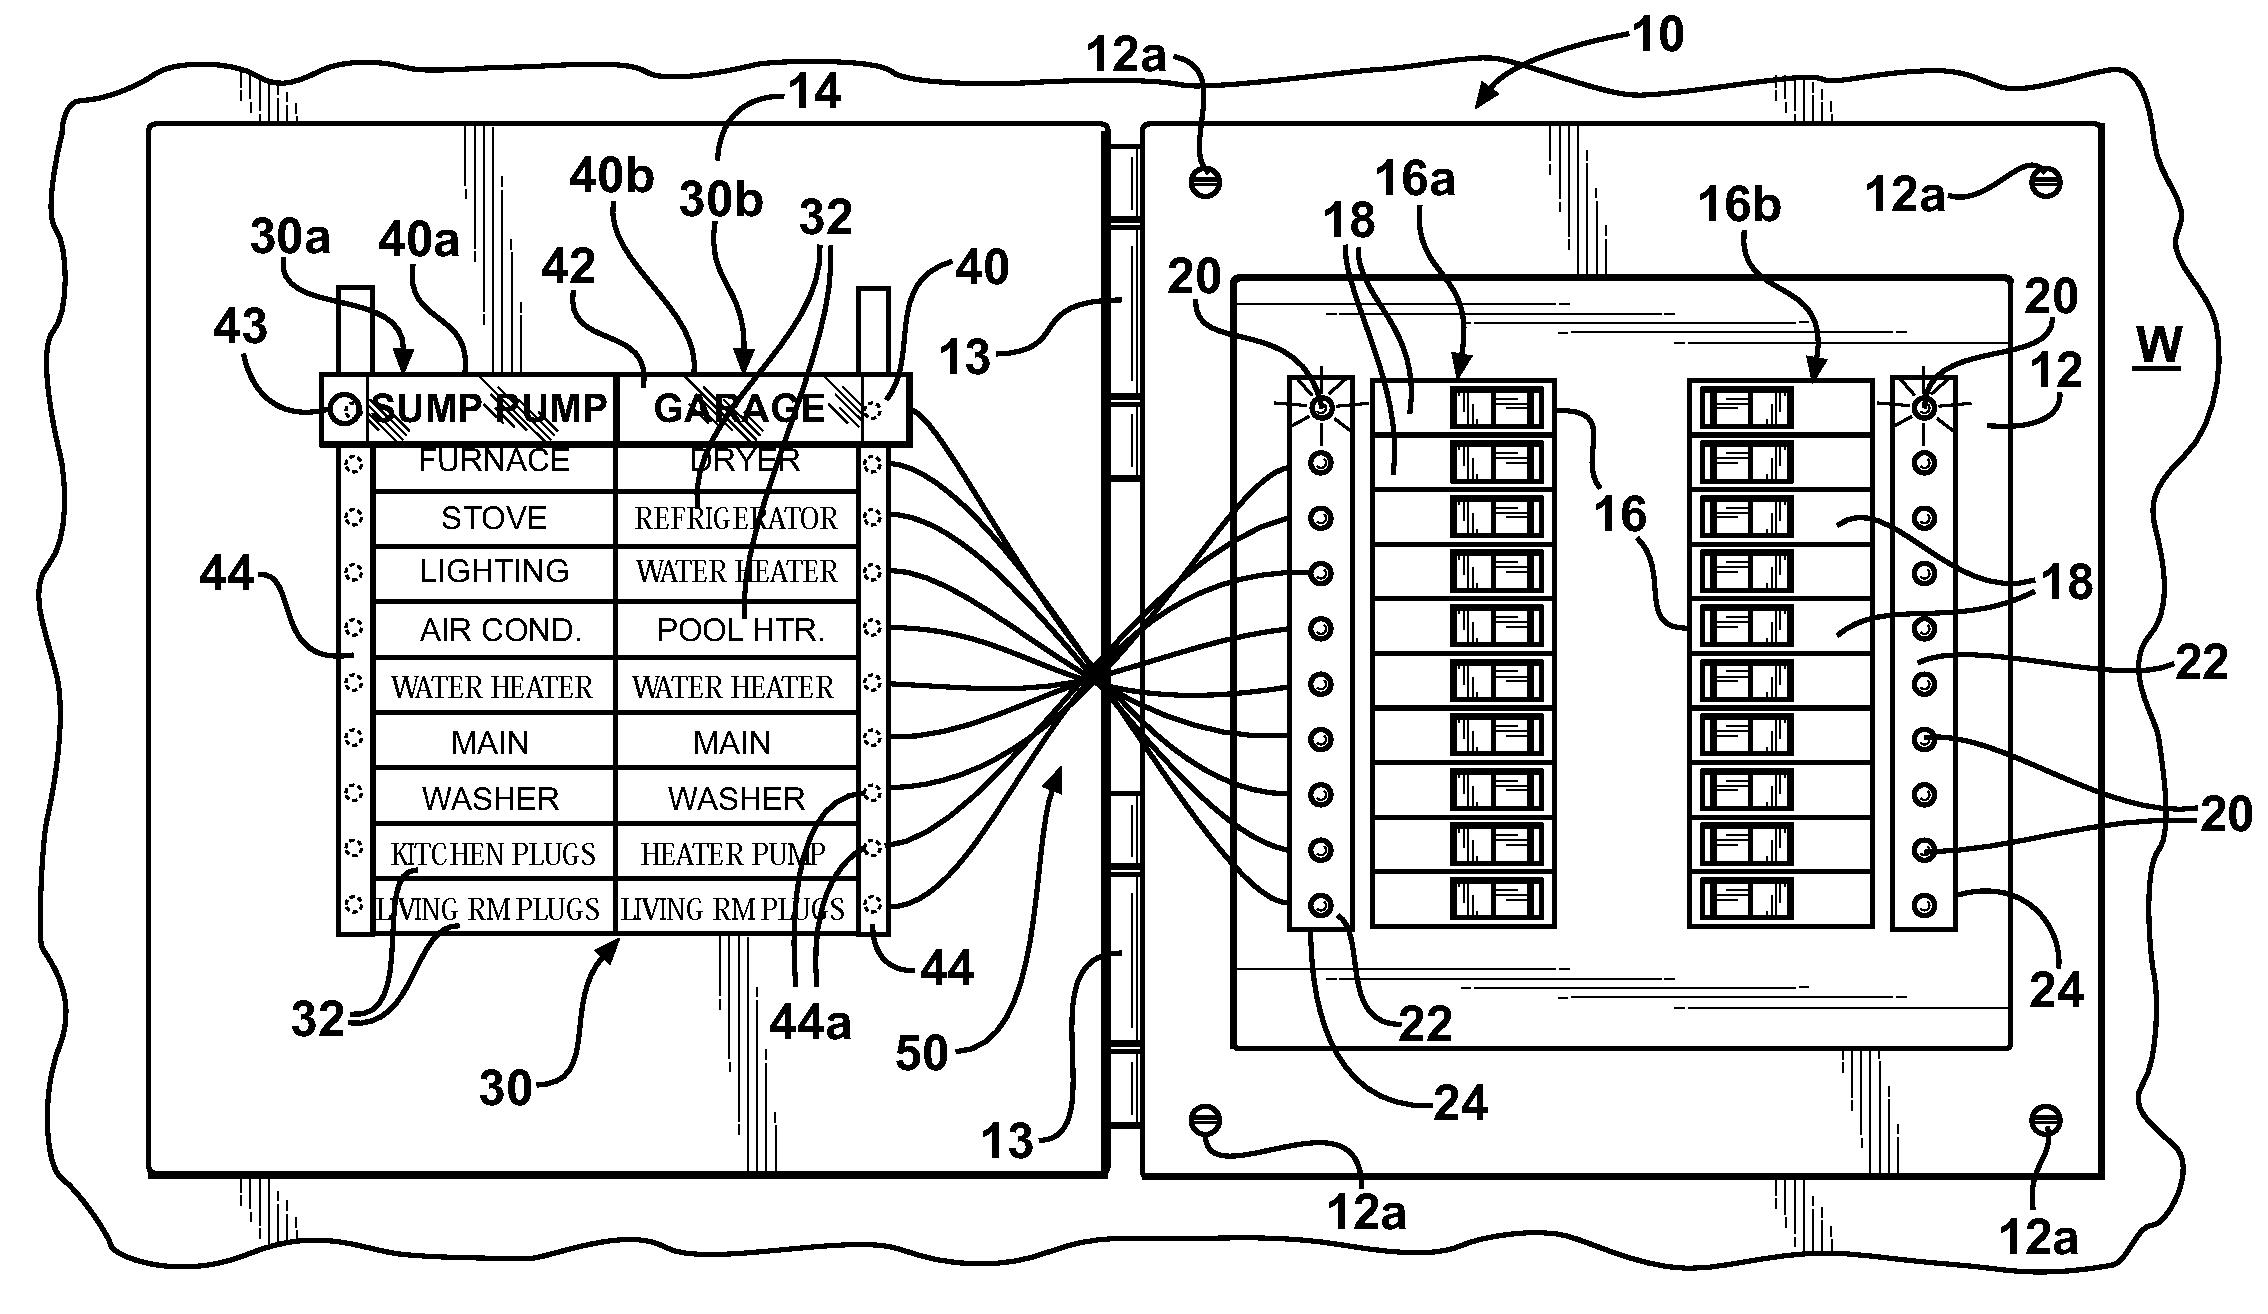 patent us7616096 - easy-to-read breaker panel